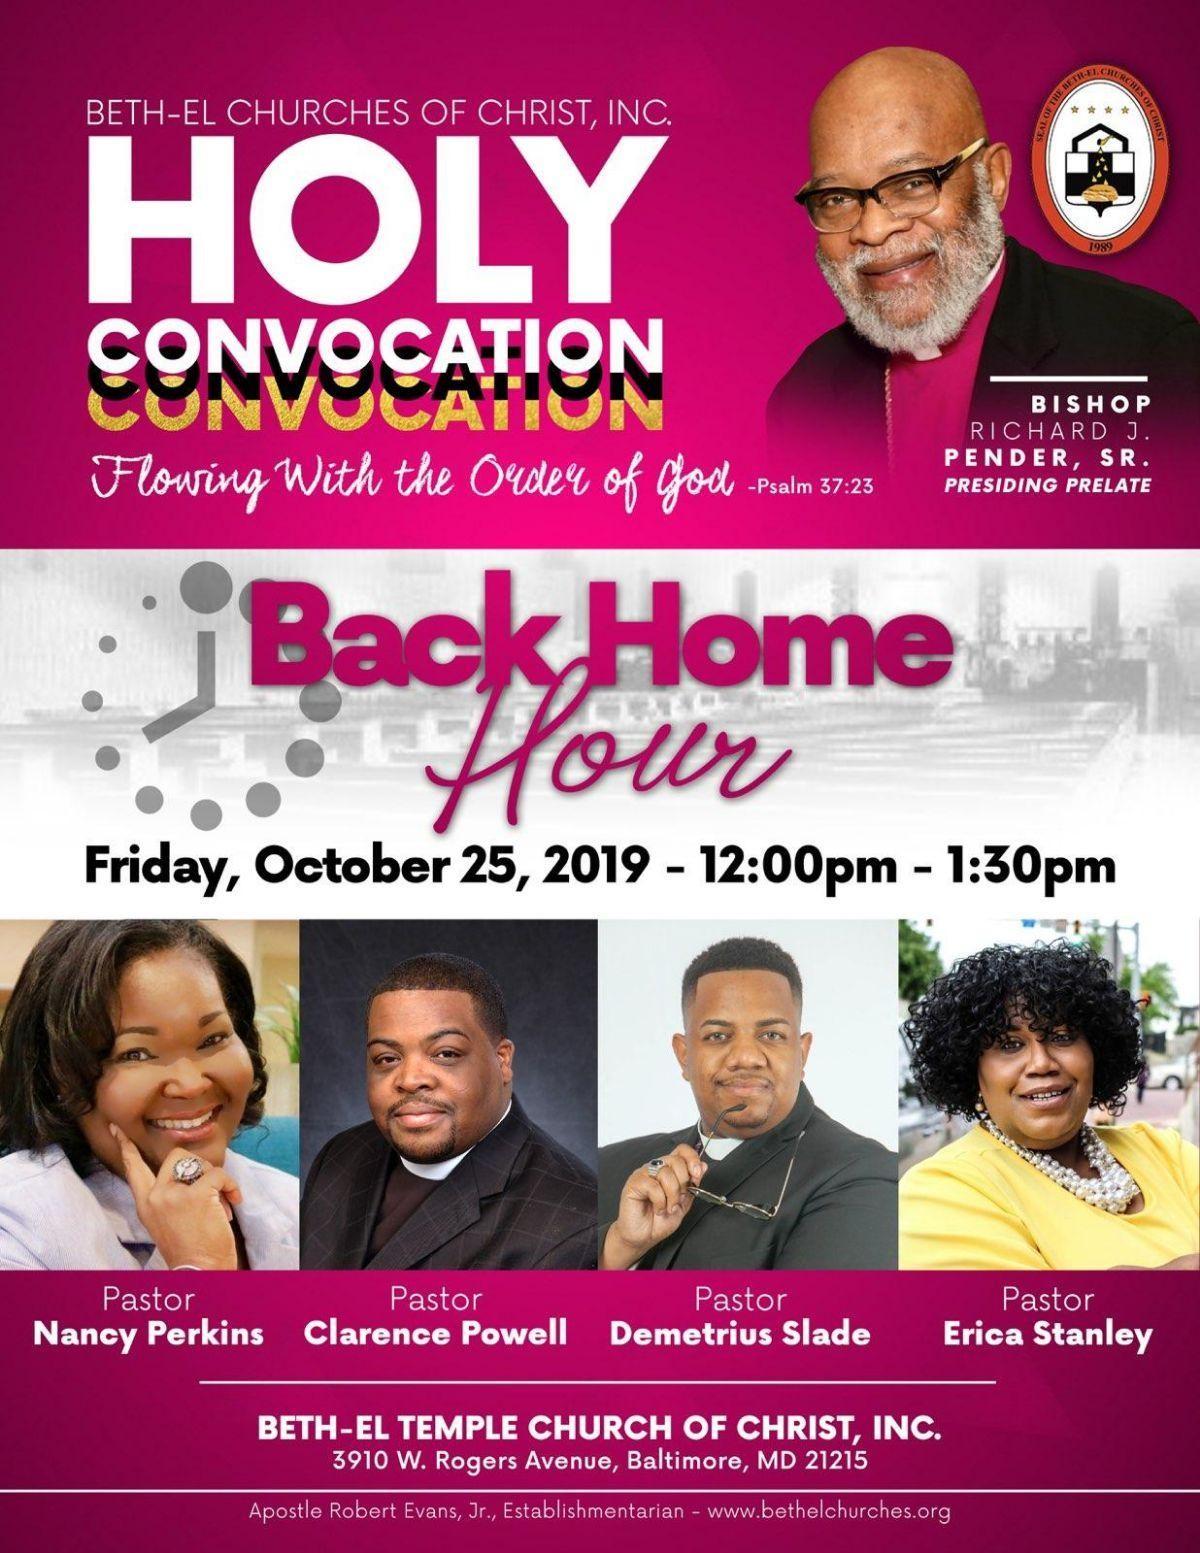 Holy Convocation Back Home Hour